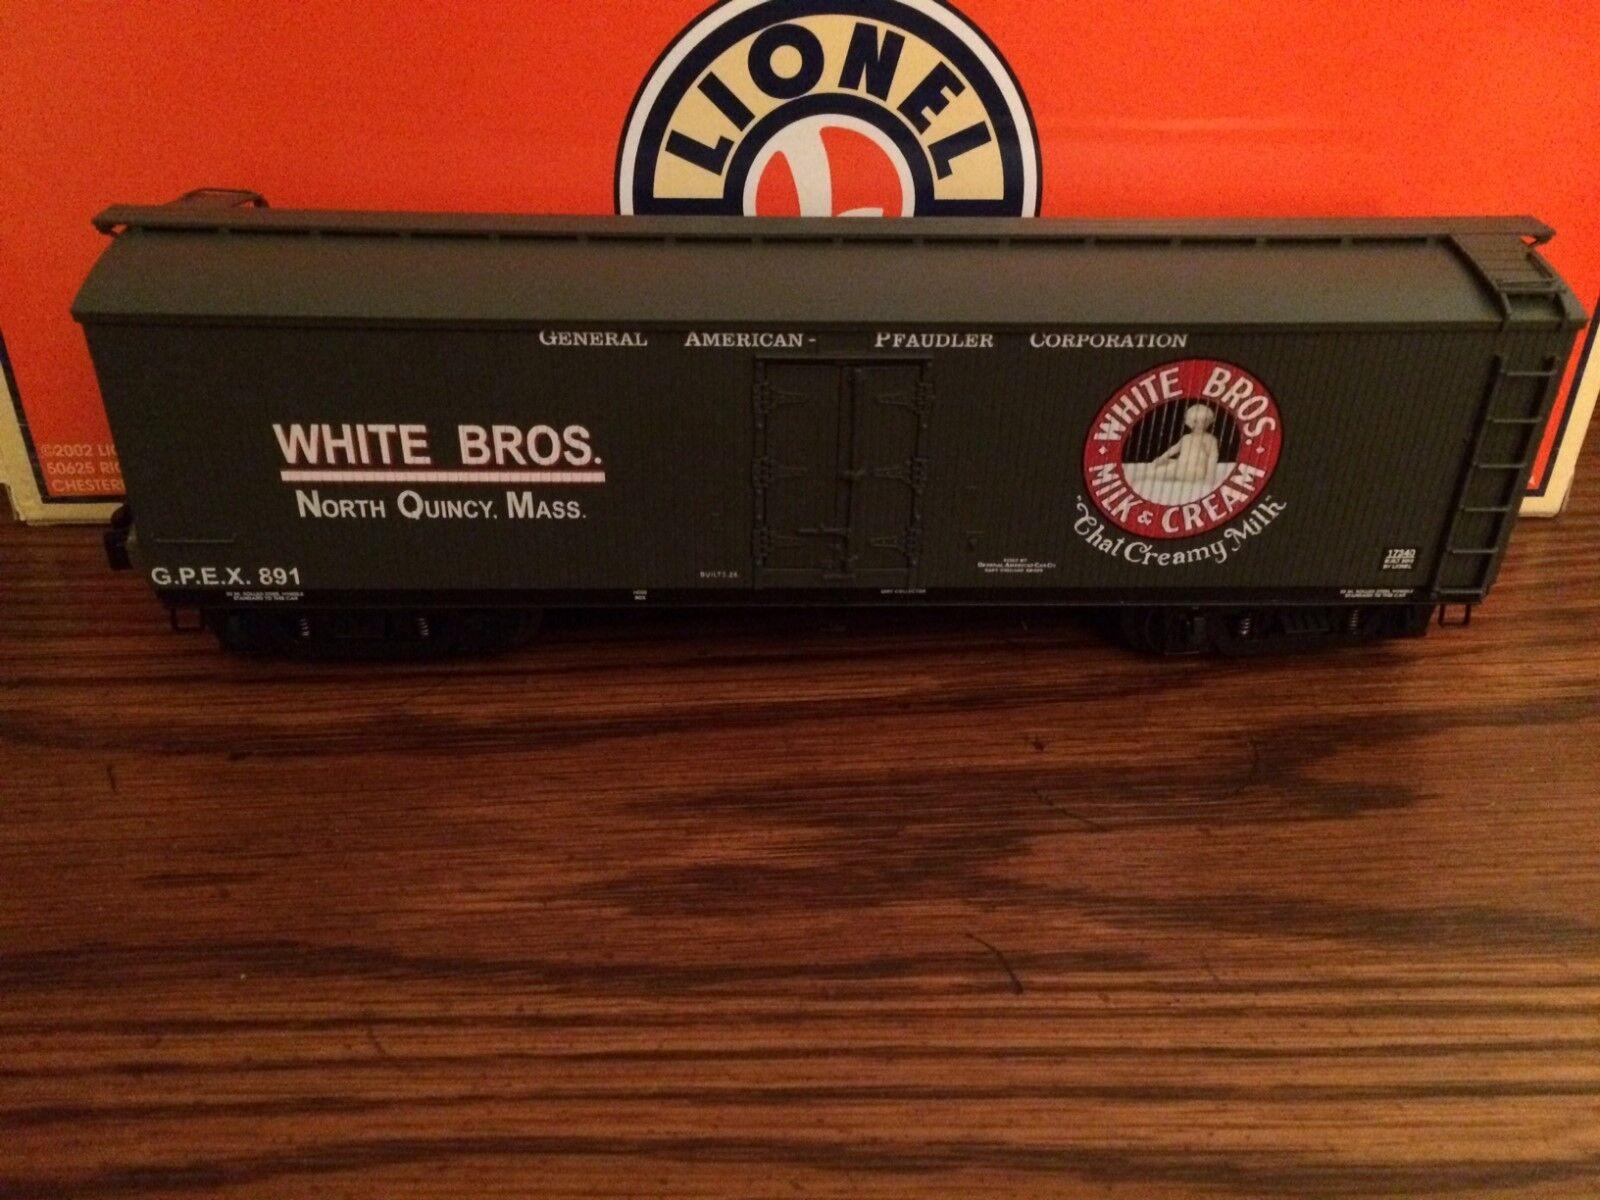 Lionel 17340 bianca Brothers Milk Car Nuovo in Box